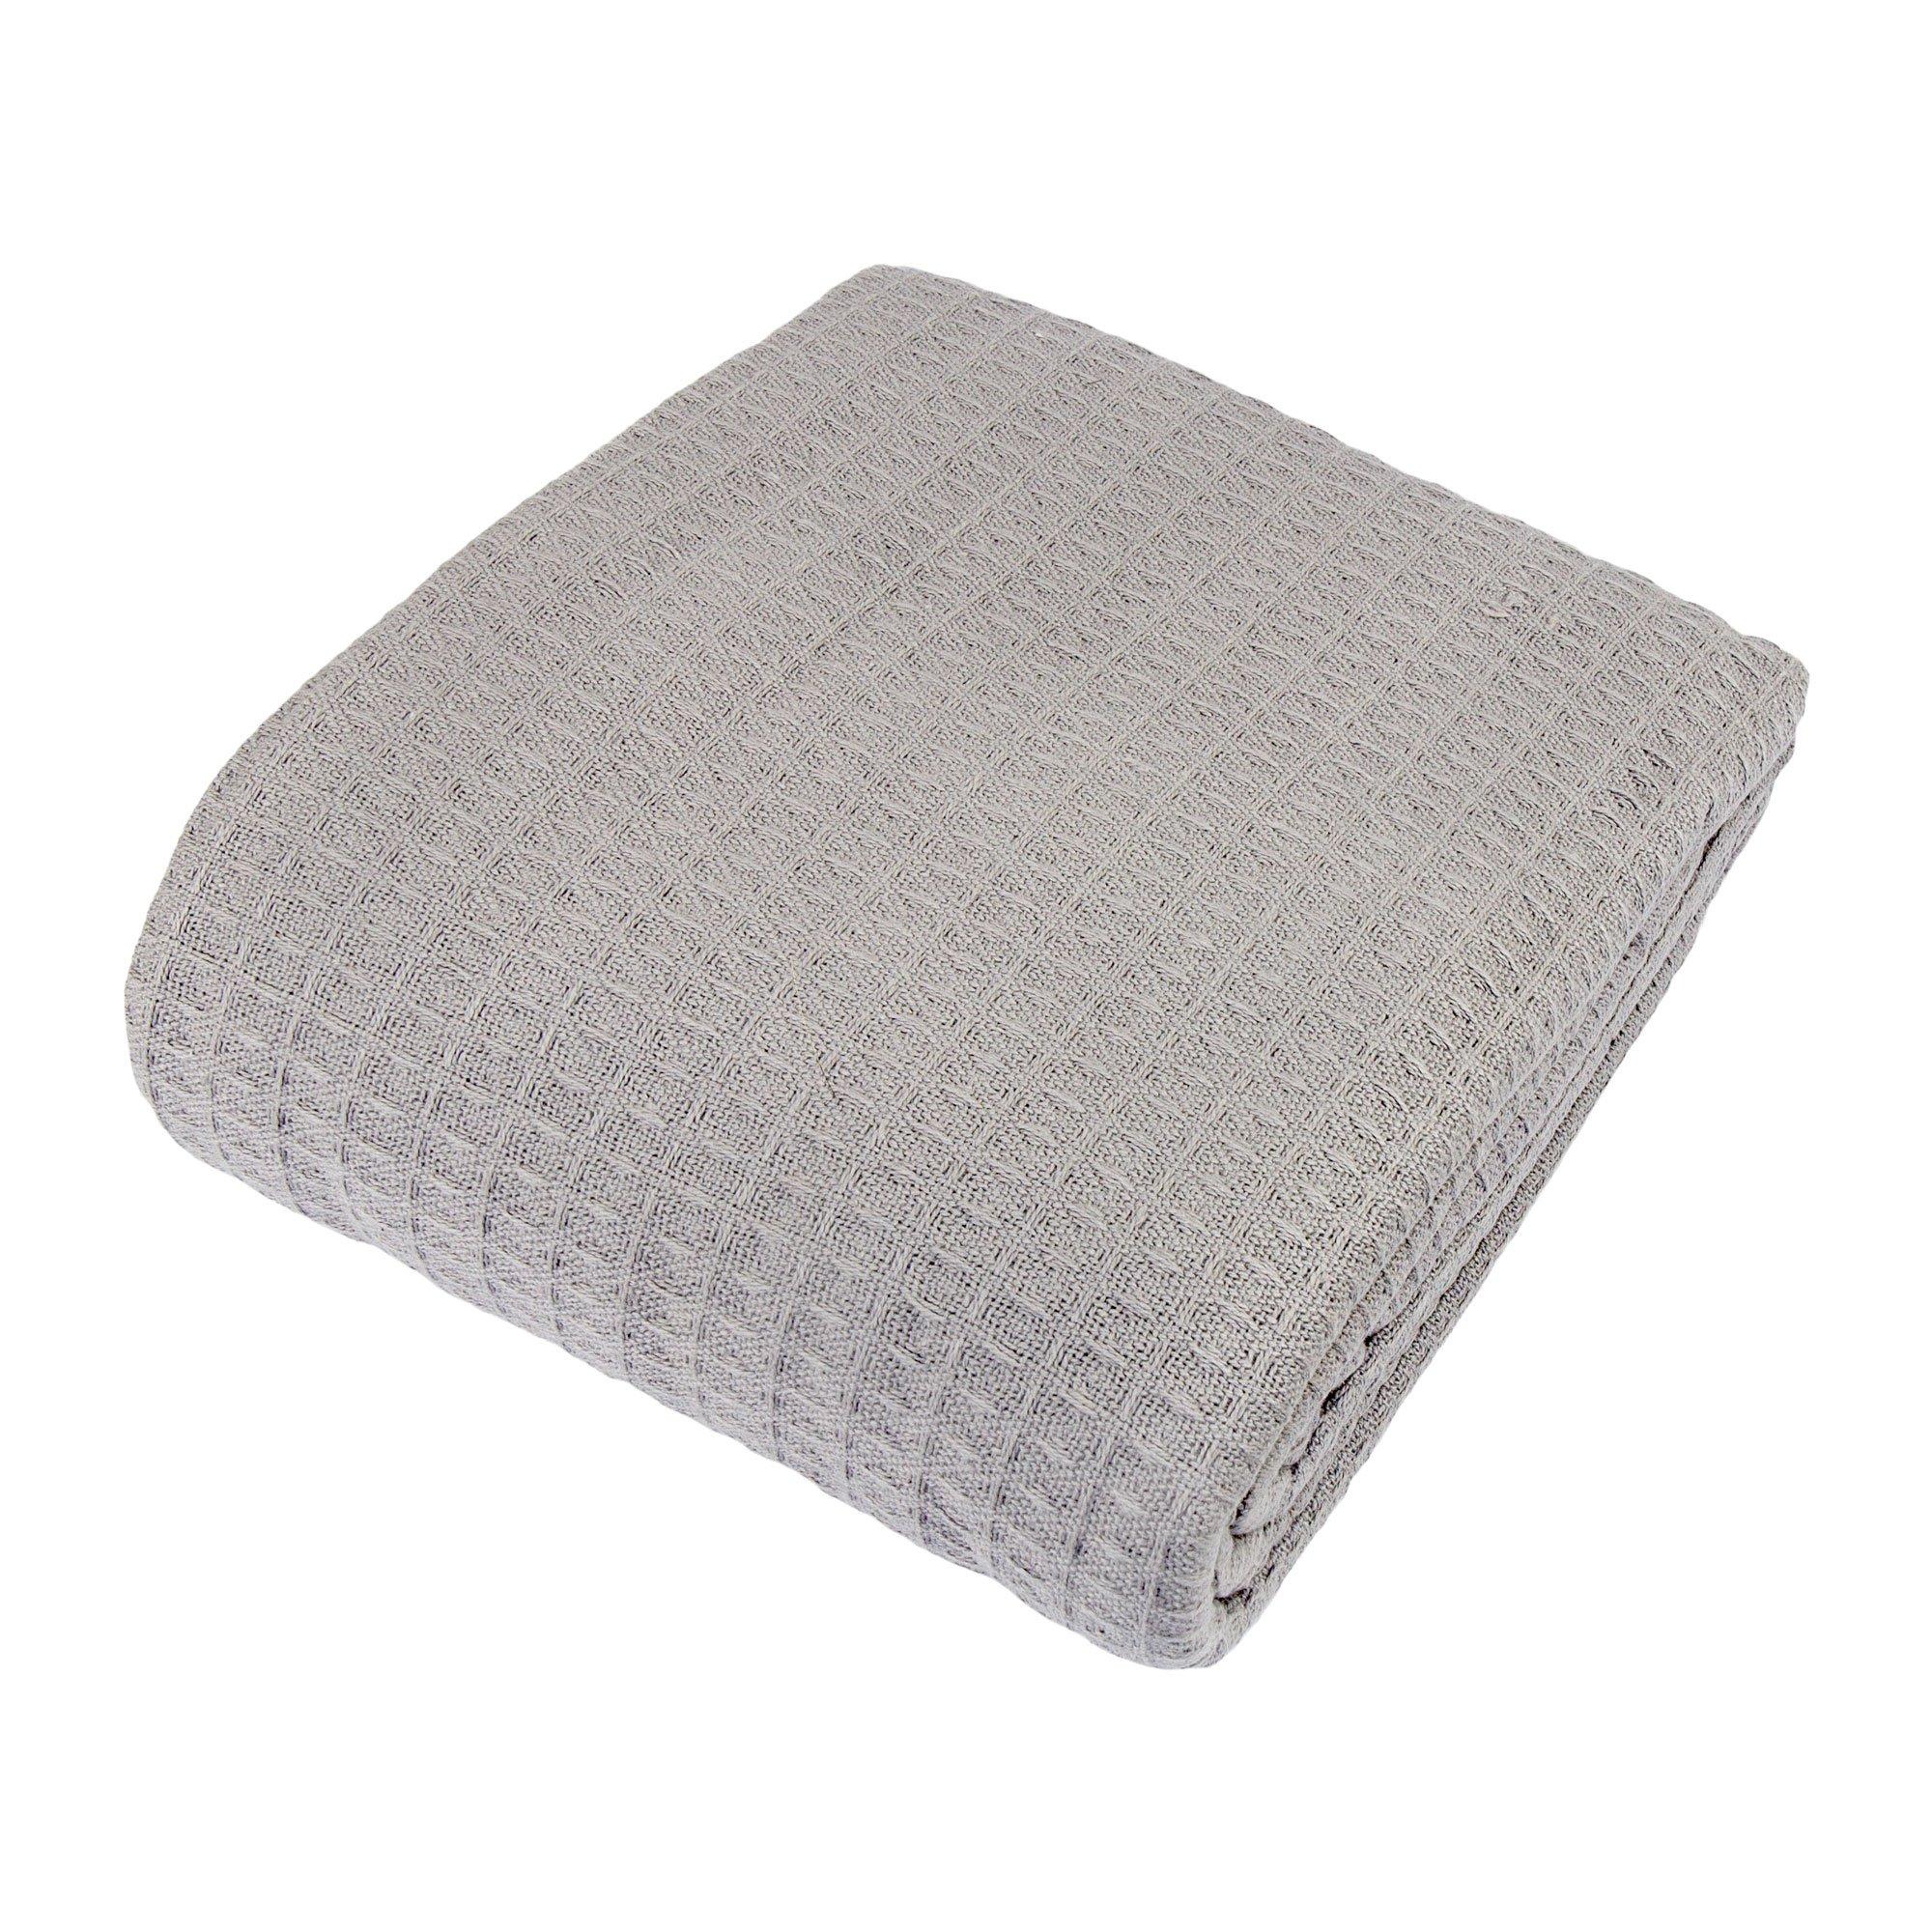 Cozy Bed - Santa Barbara Waffle Weave Cotton Blanket, King, Gray